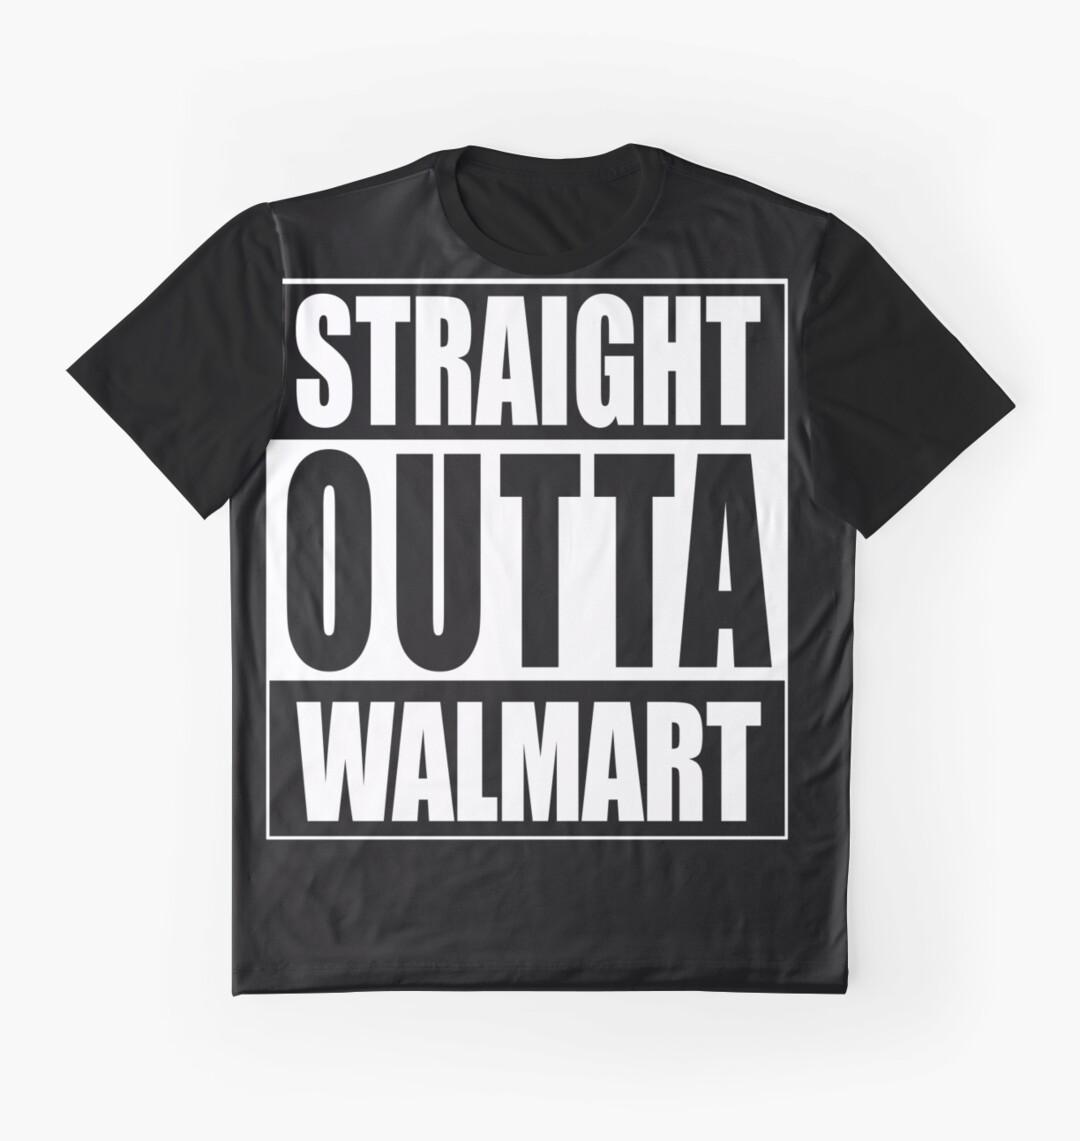 Black t shirt at walmart - Straight Outta Walmart Graphic T Shirts